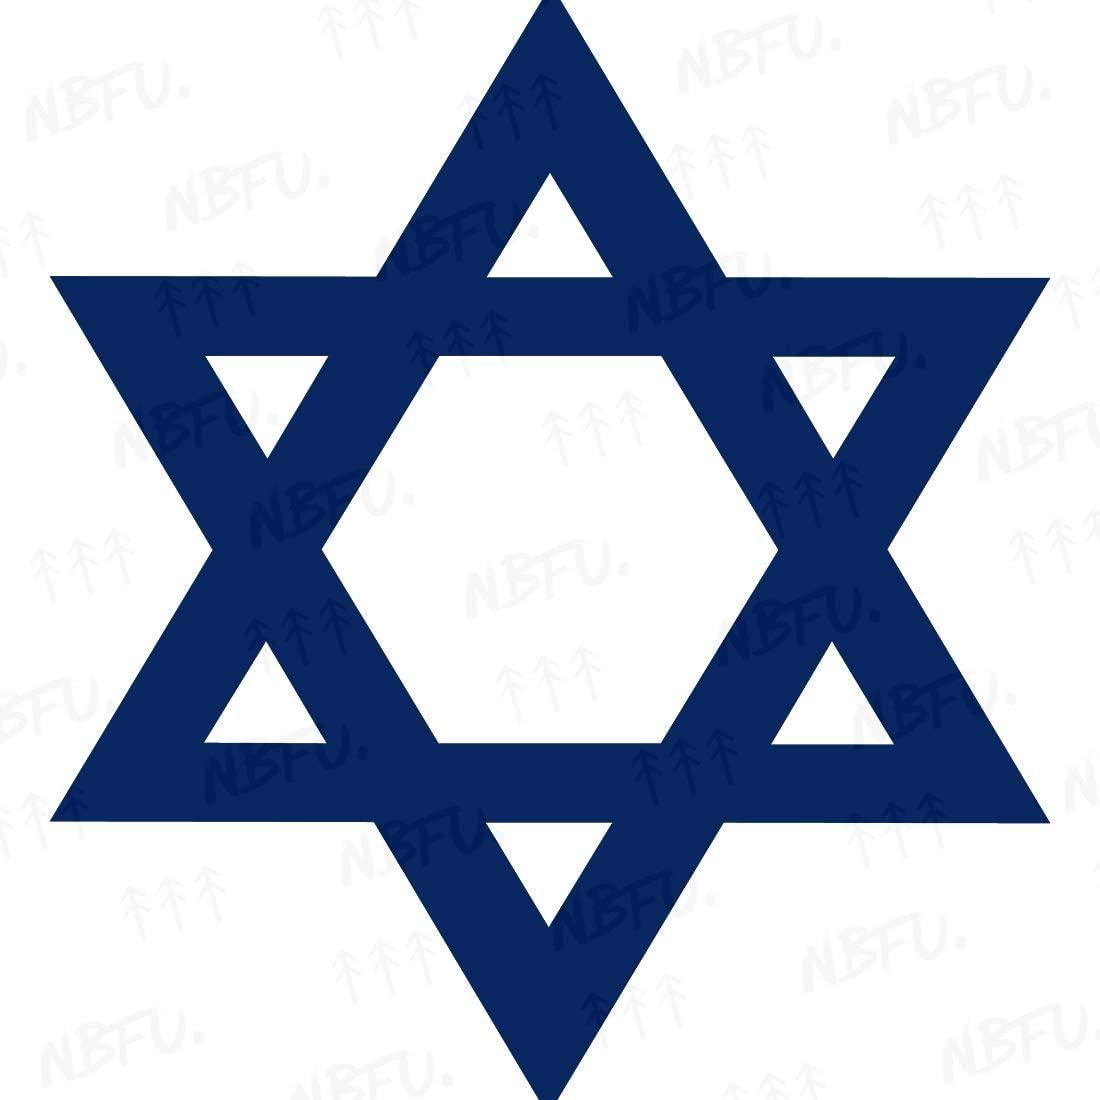 NBFU Decals Judaism Jewish Star David Religious Symbols 1 (Navy Blue) (Set of 2) Premium Waterproof Vinyl Decal Stickers Laptop Phone Accessory Helmet Car Window Bumper Mug Tuber Cup Door Wall